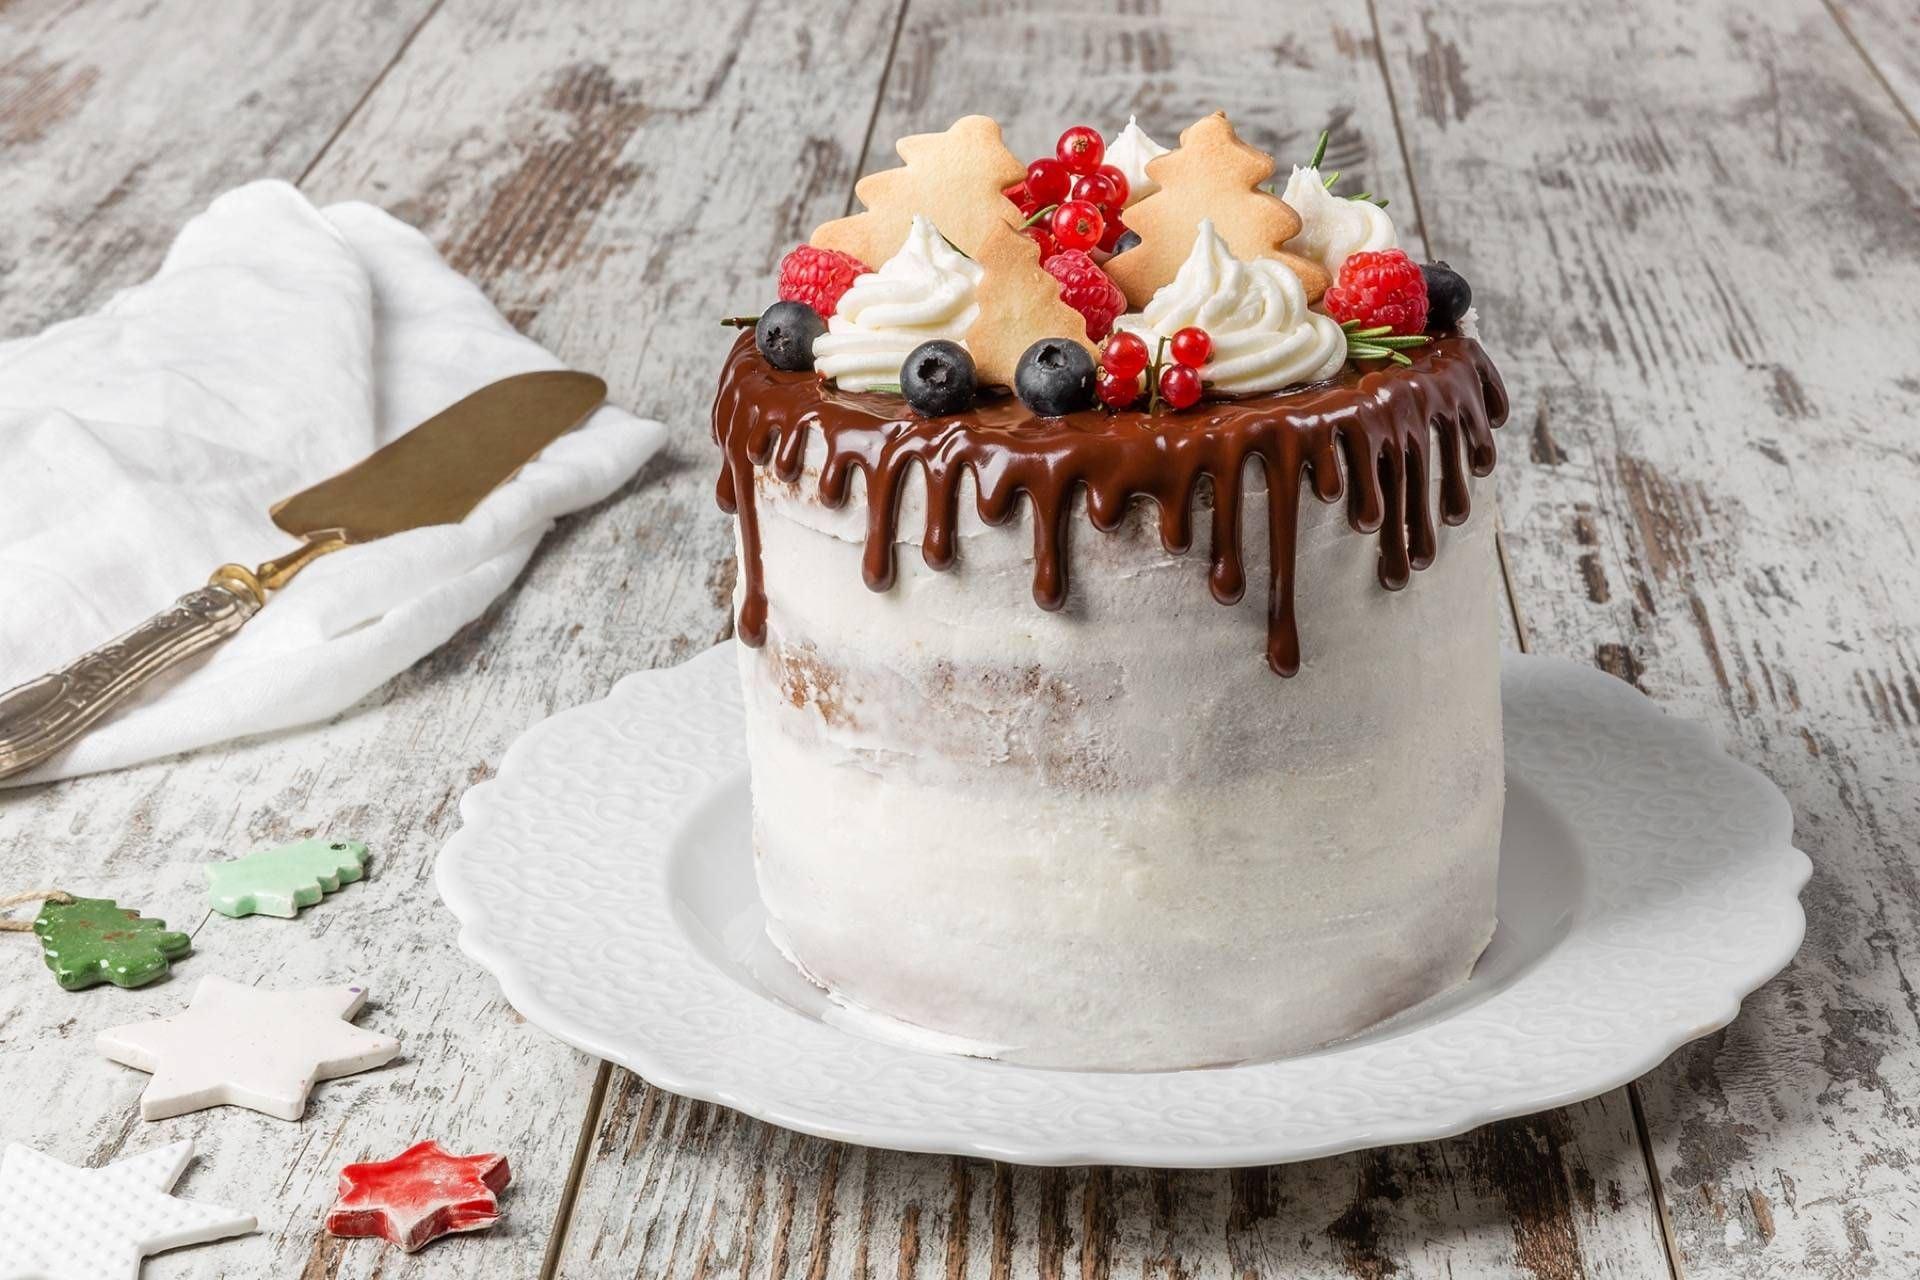 Dripping Cake di Natale - Parmalat